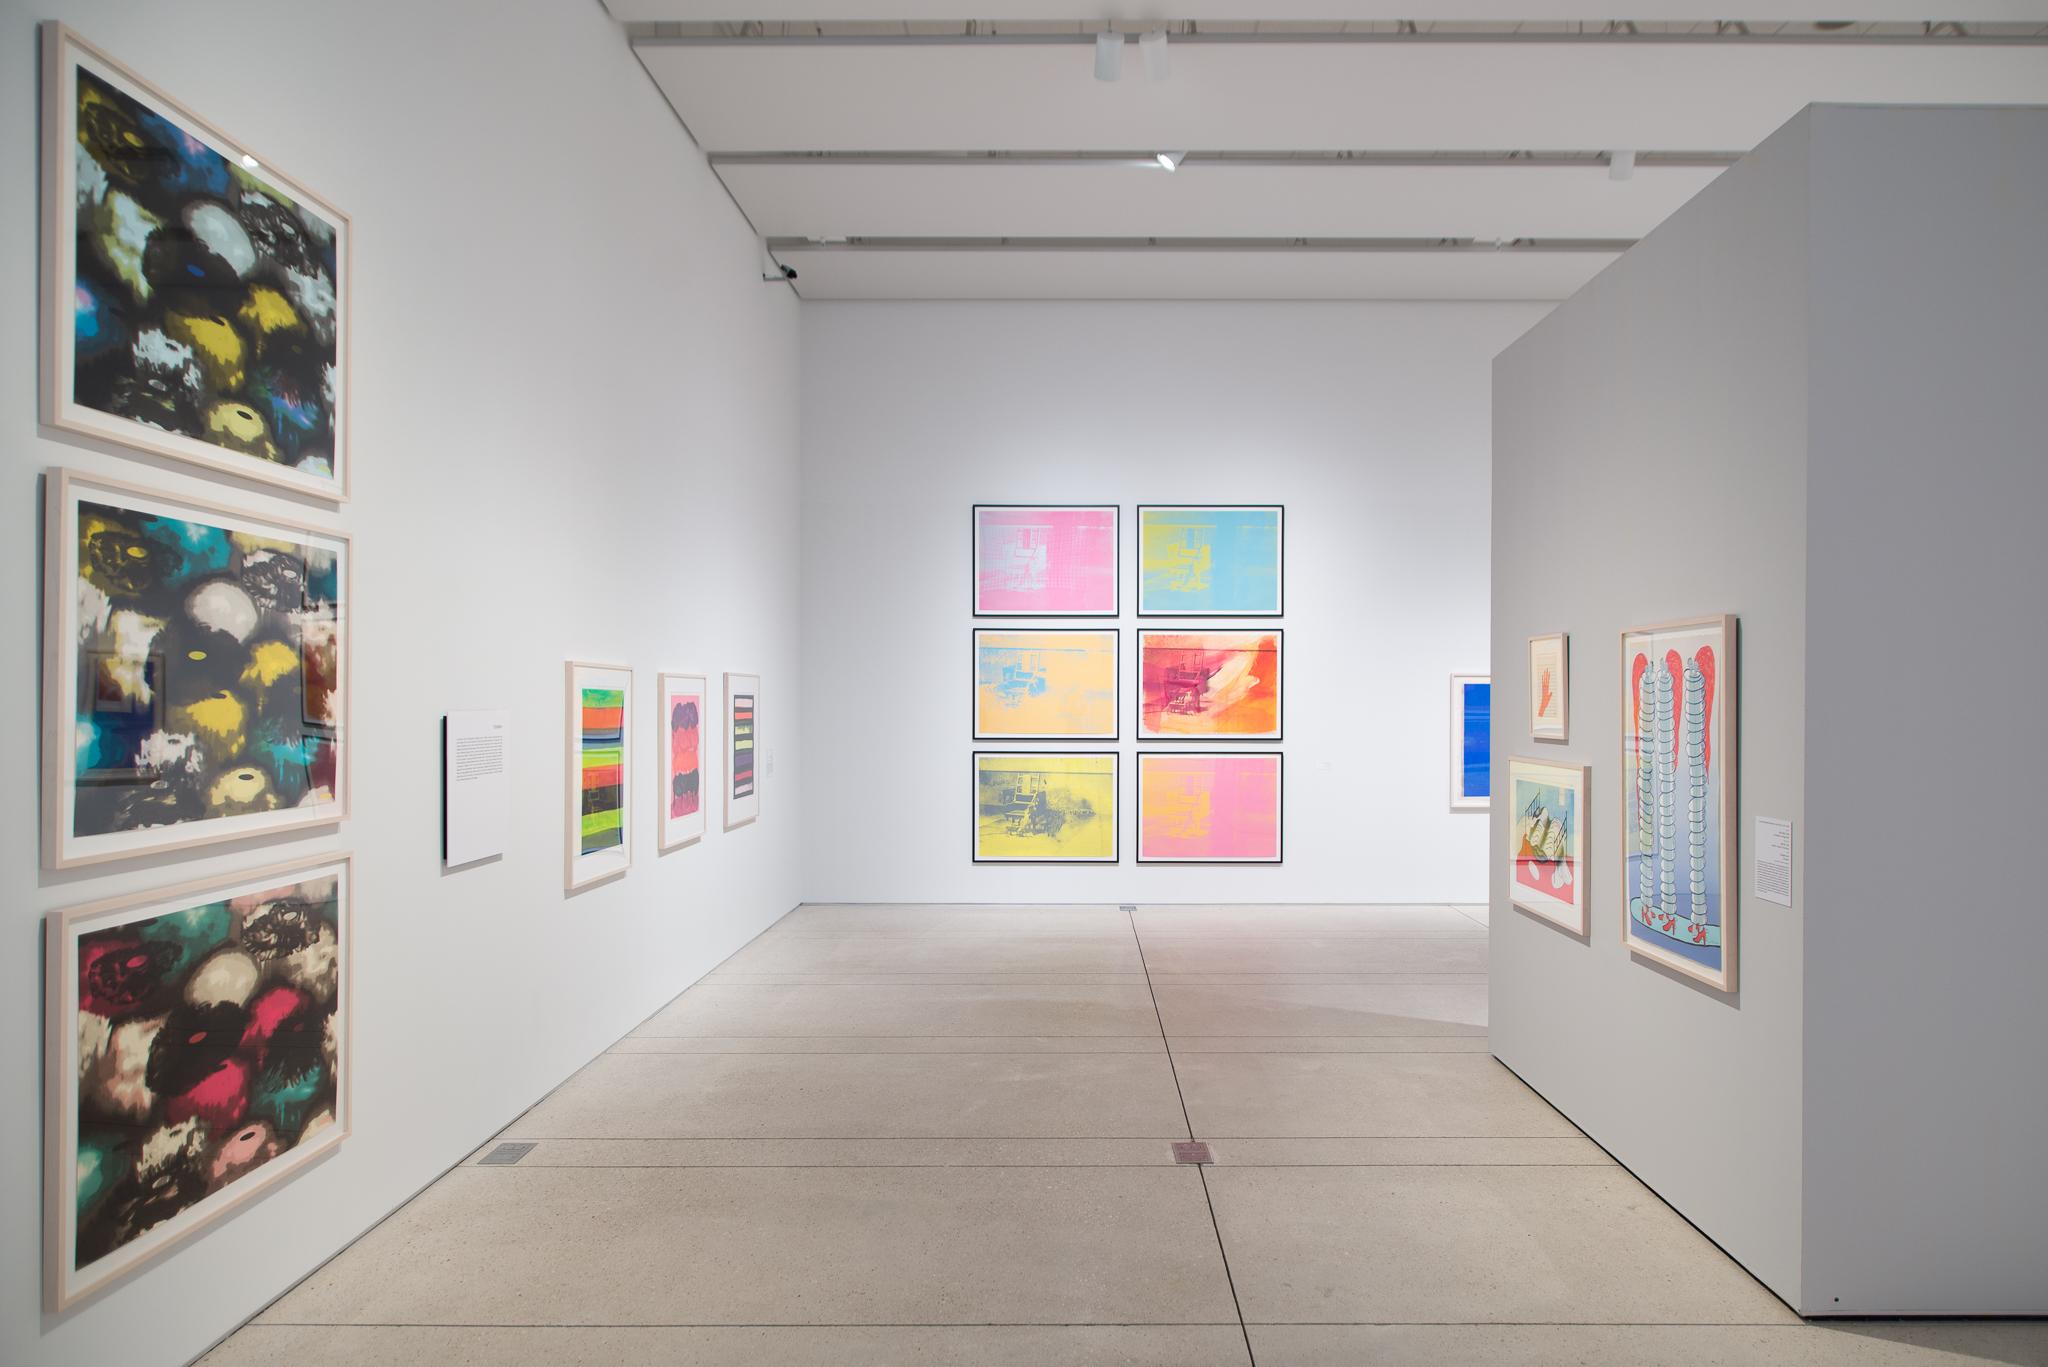 tampa museum--in living color, 25.jpg